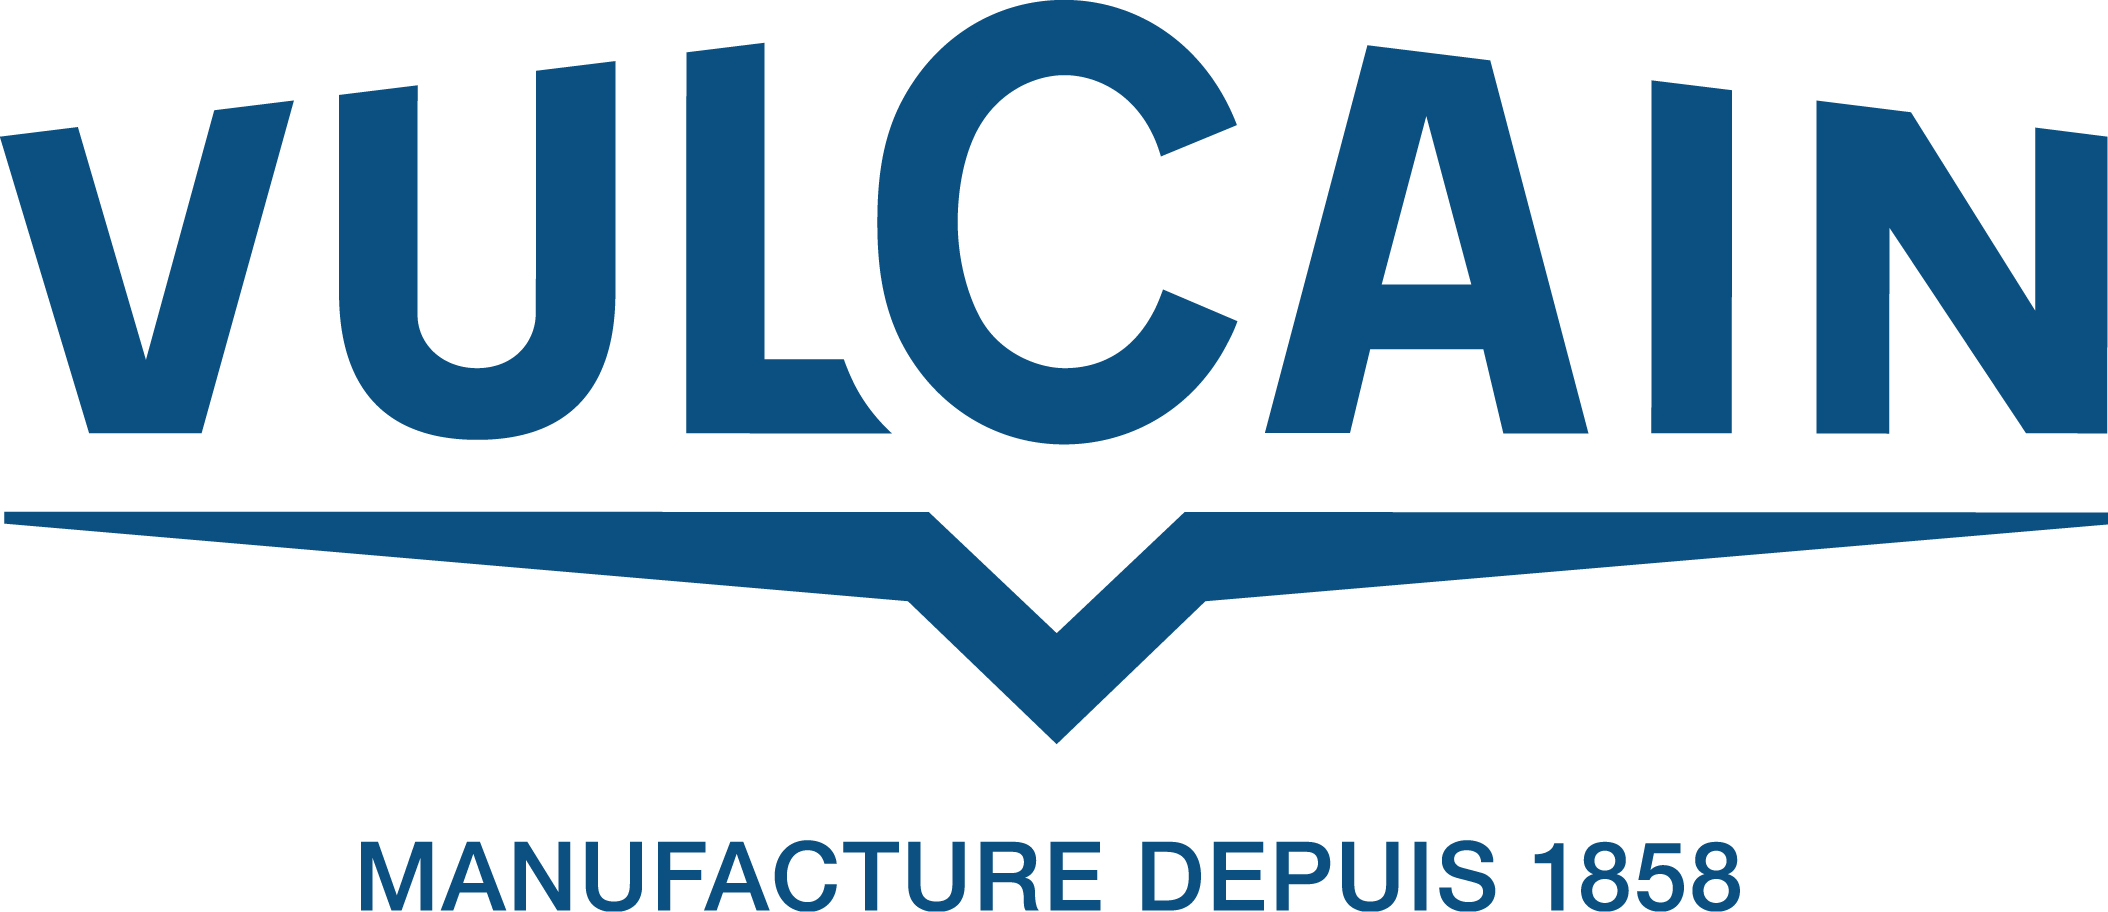 File:Logo Vulcain Watches.jpg - Wikimedia Commons